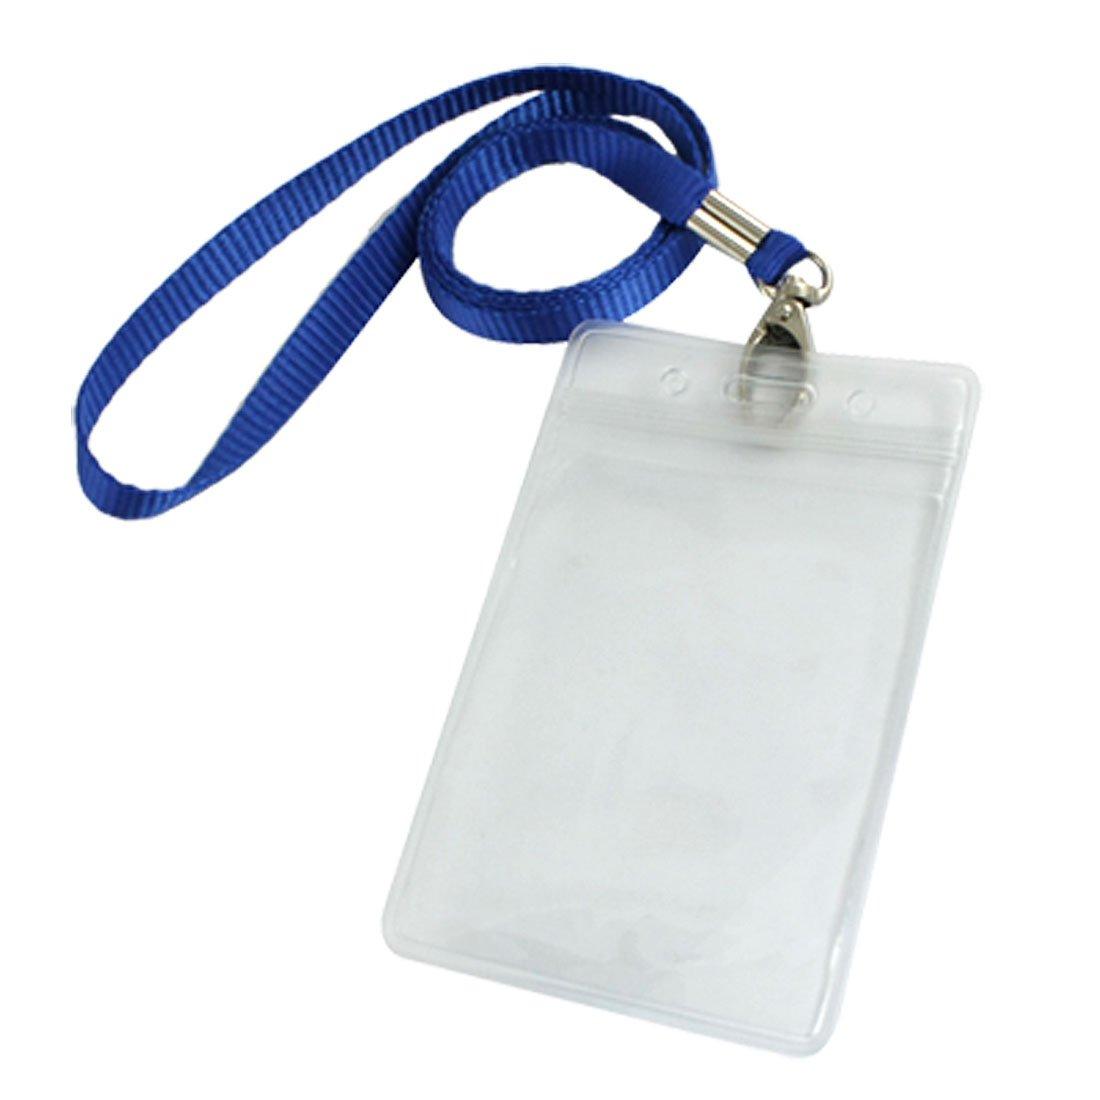 IMC Wholesale Vertical Clear Plastic ID Badge Card Holder w Neck Strap 2 Pcs<br><br>Aliexpress